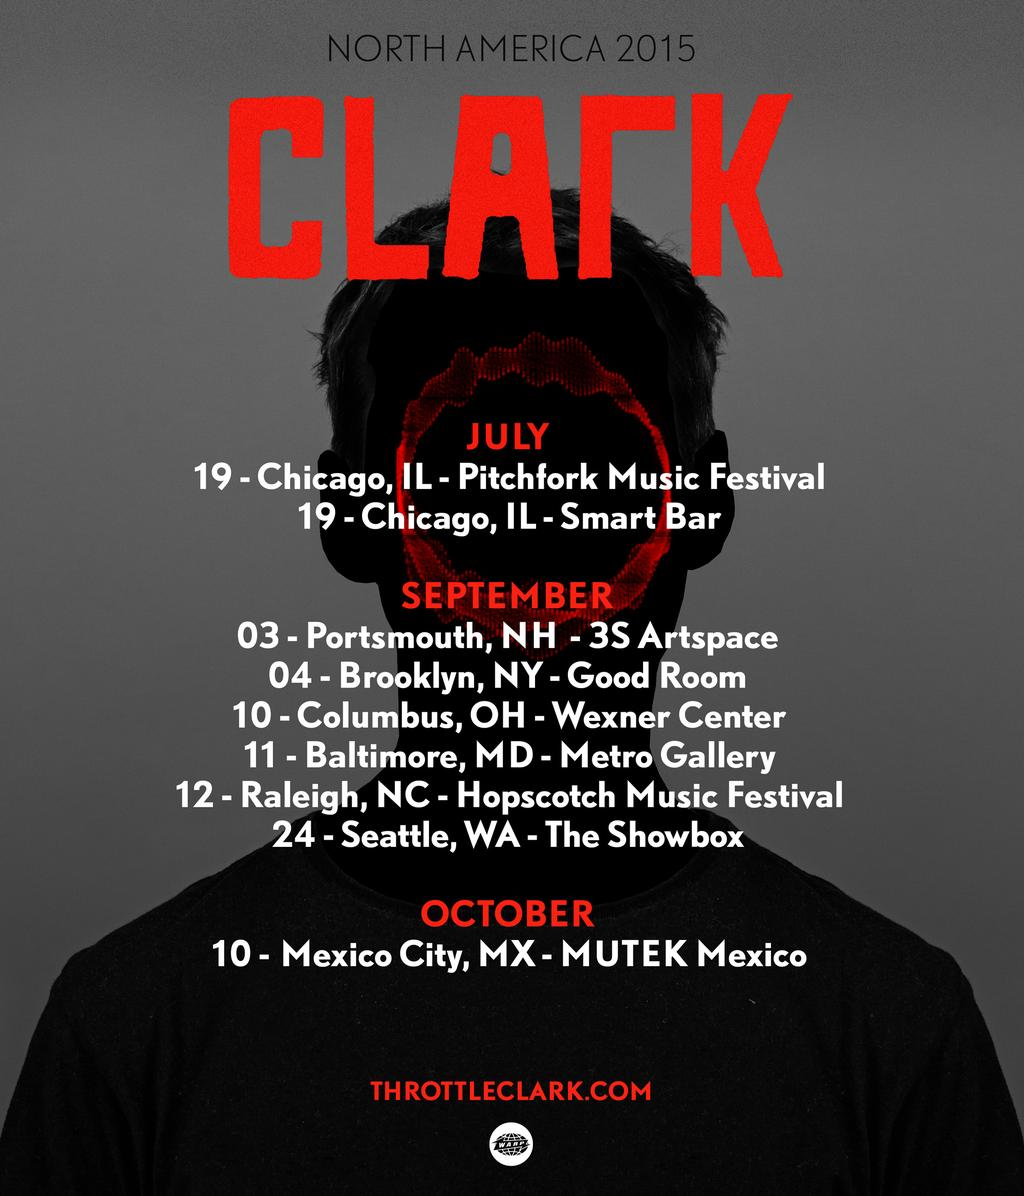 Tour dates in North America 2015